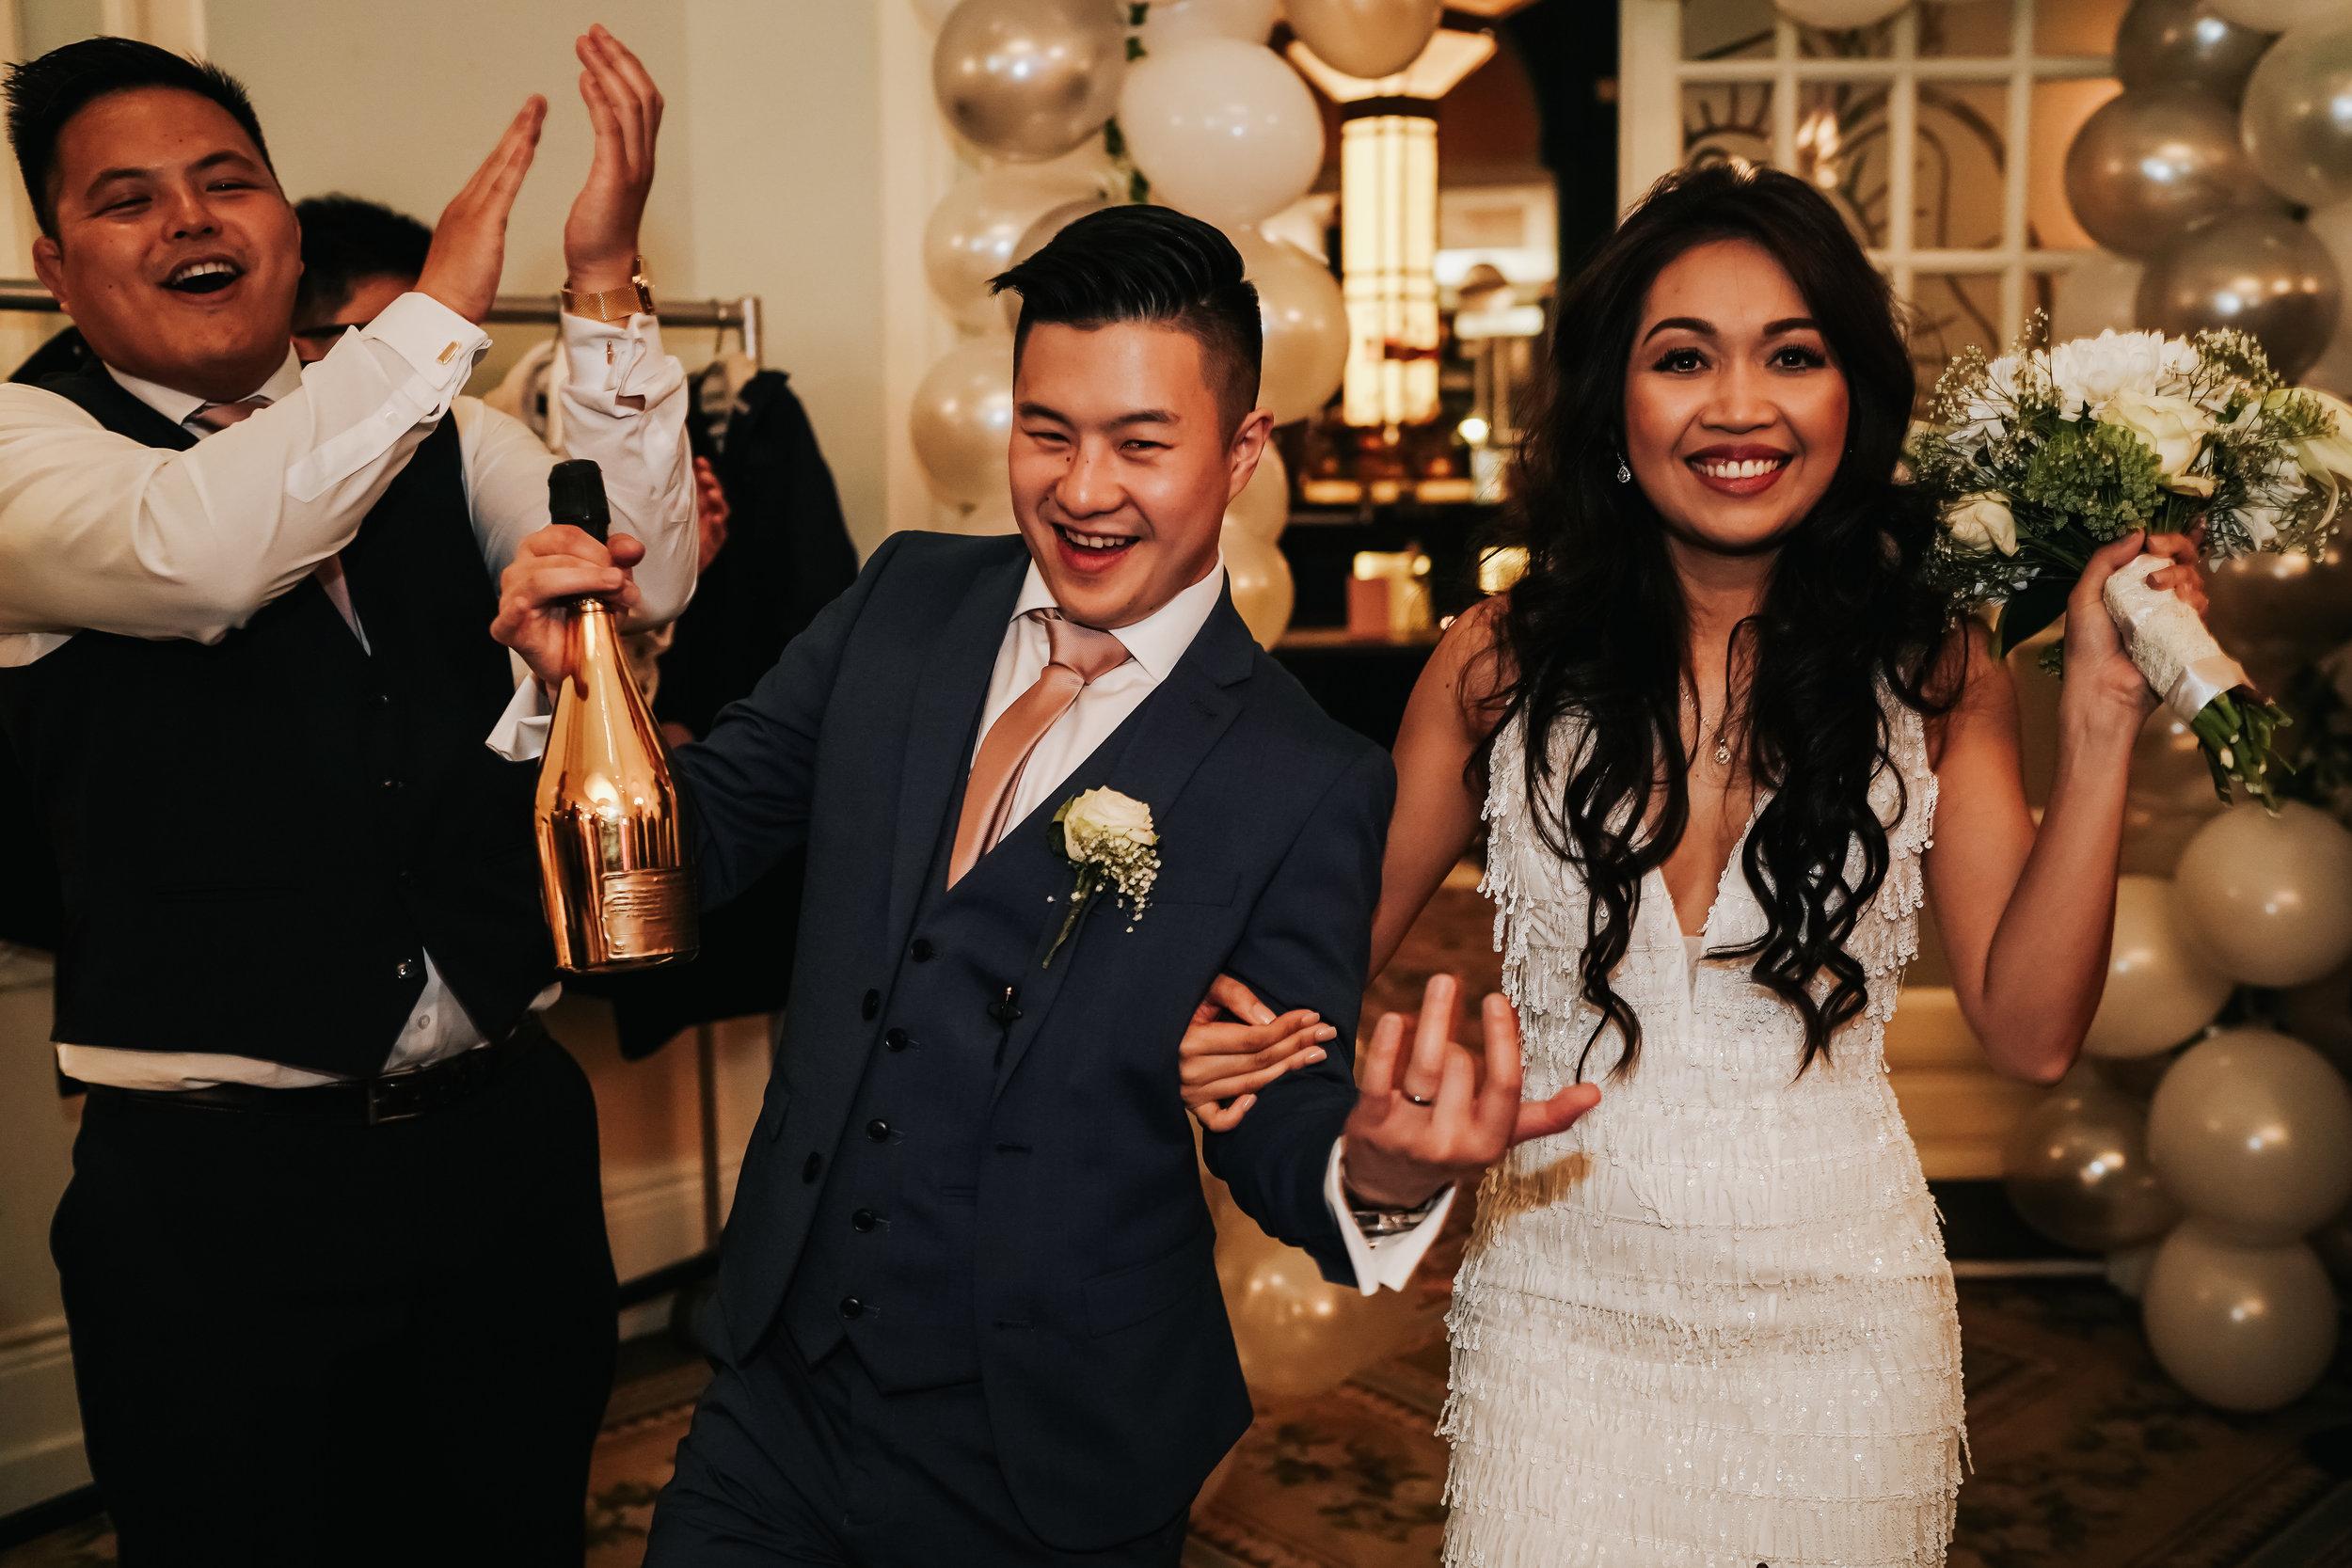 Chinese Wedding Photography Manchester wedding photographer Cheshire - 049.jpg